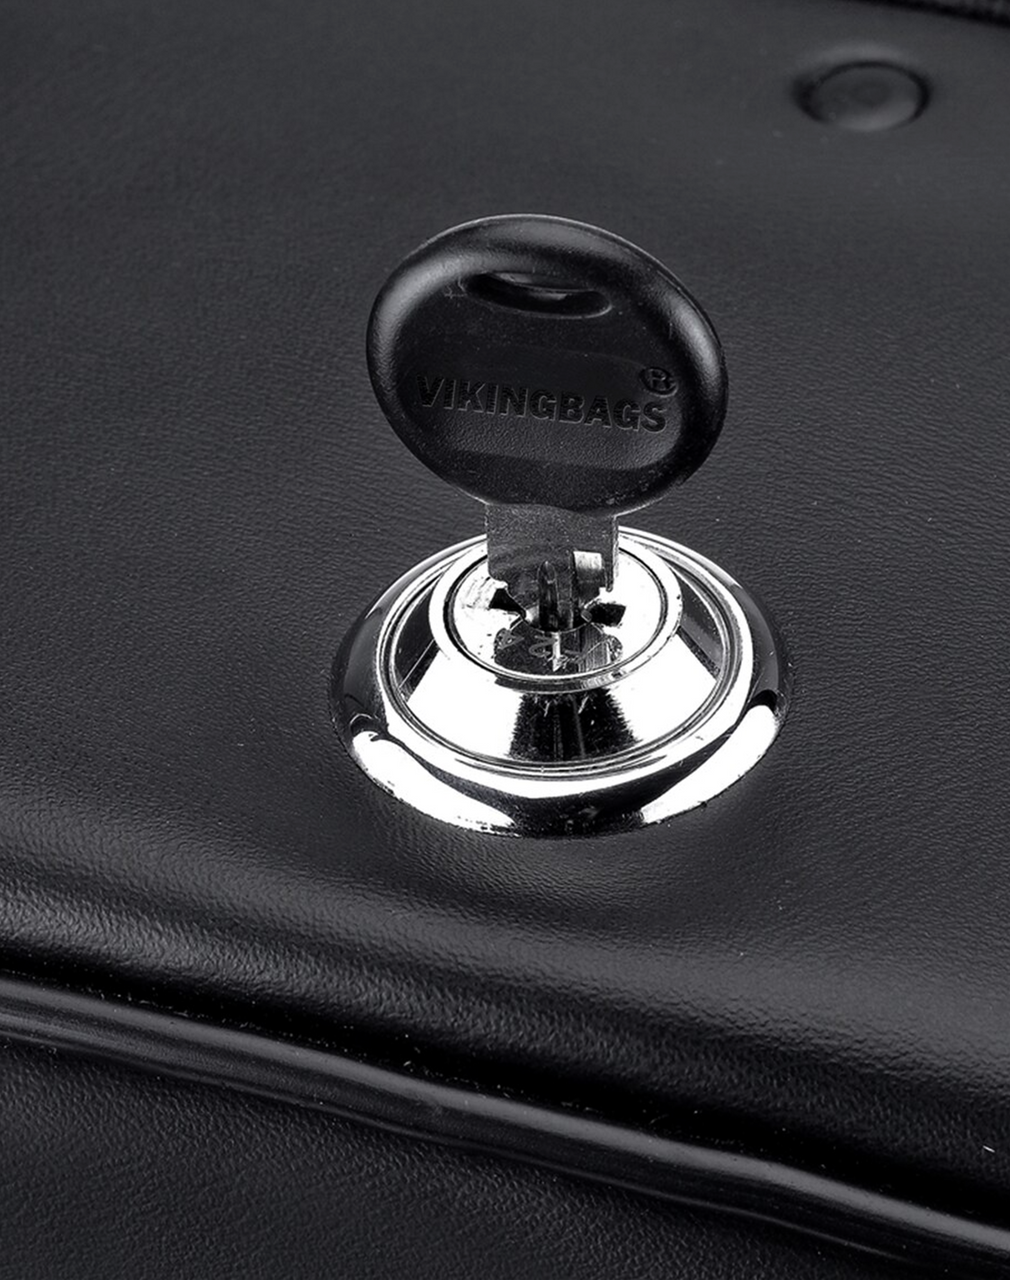 Honda VTX 1800 R Charger Single Strap Medium Motorcycle Saddlebags Key Lockable View